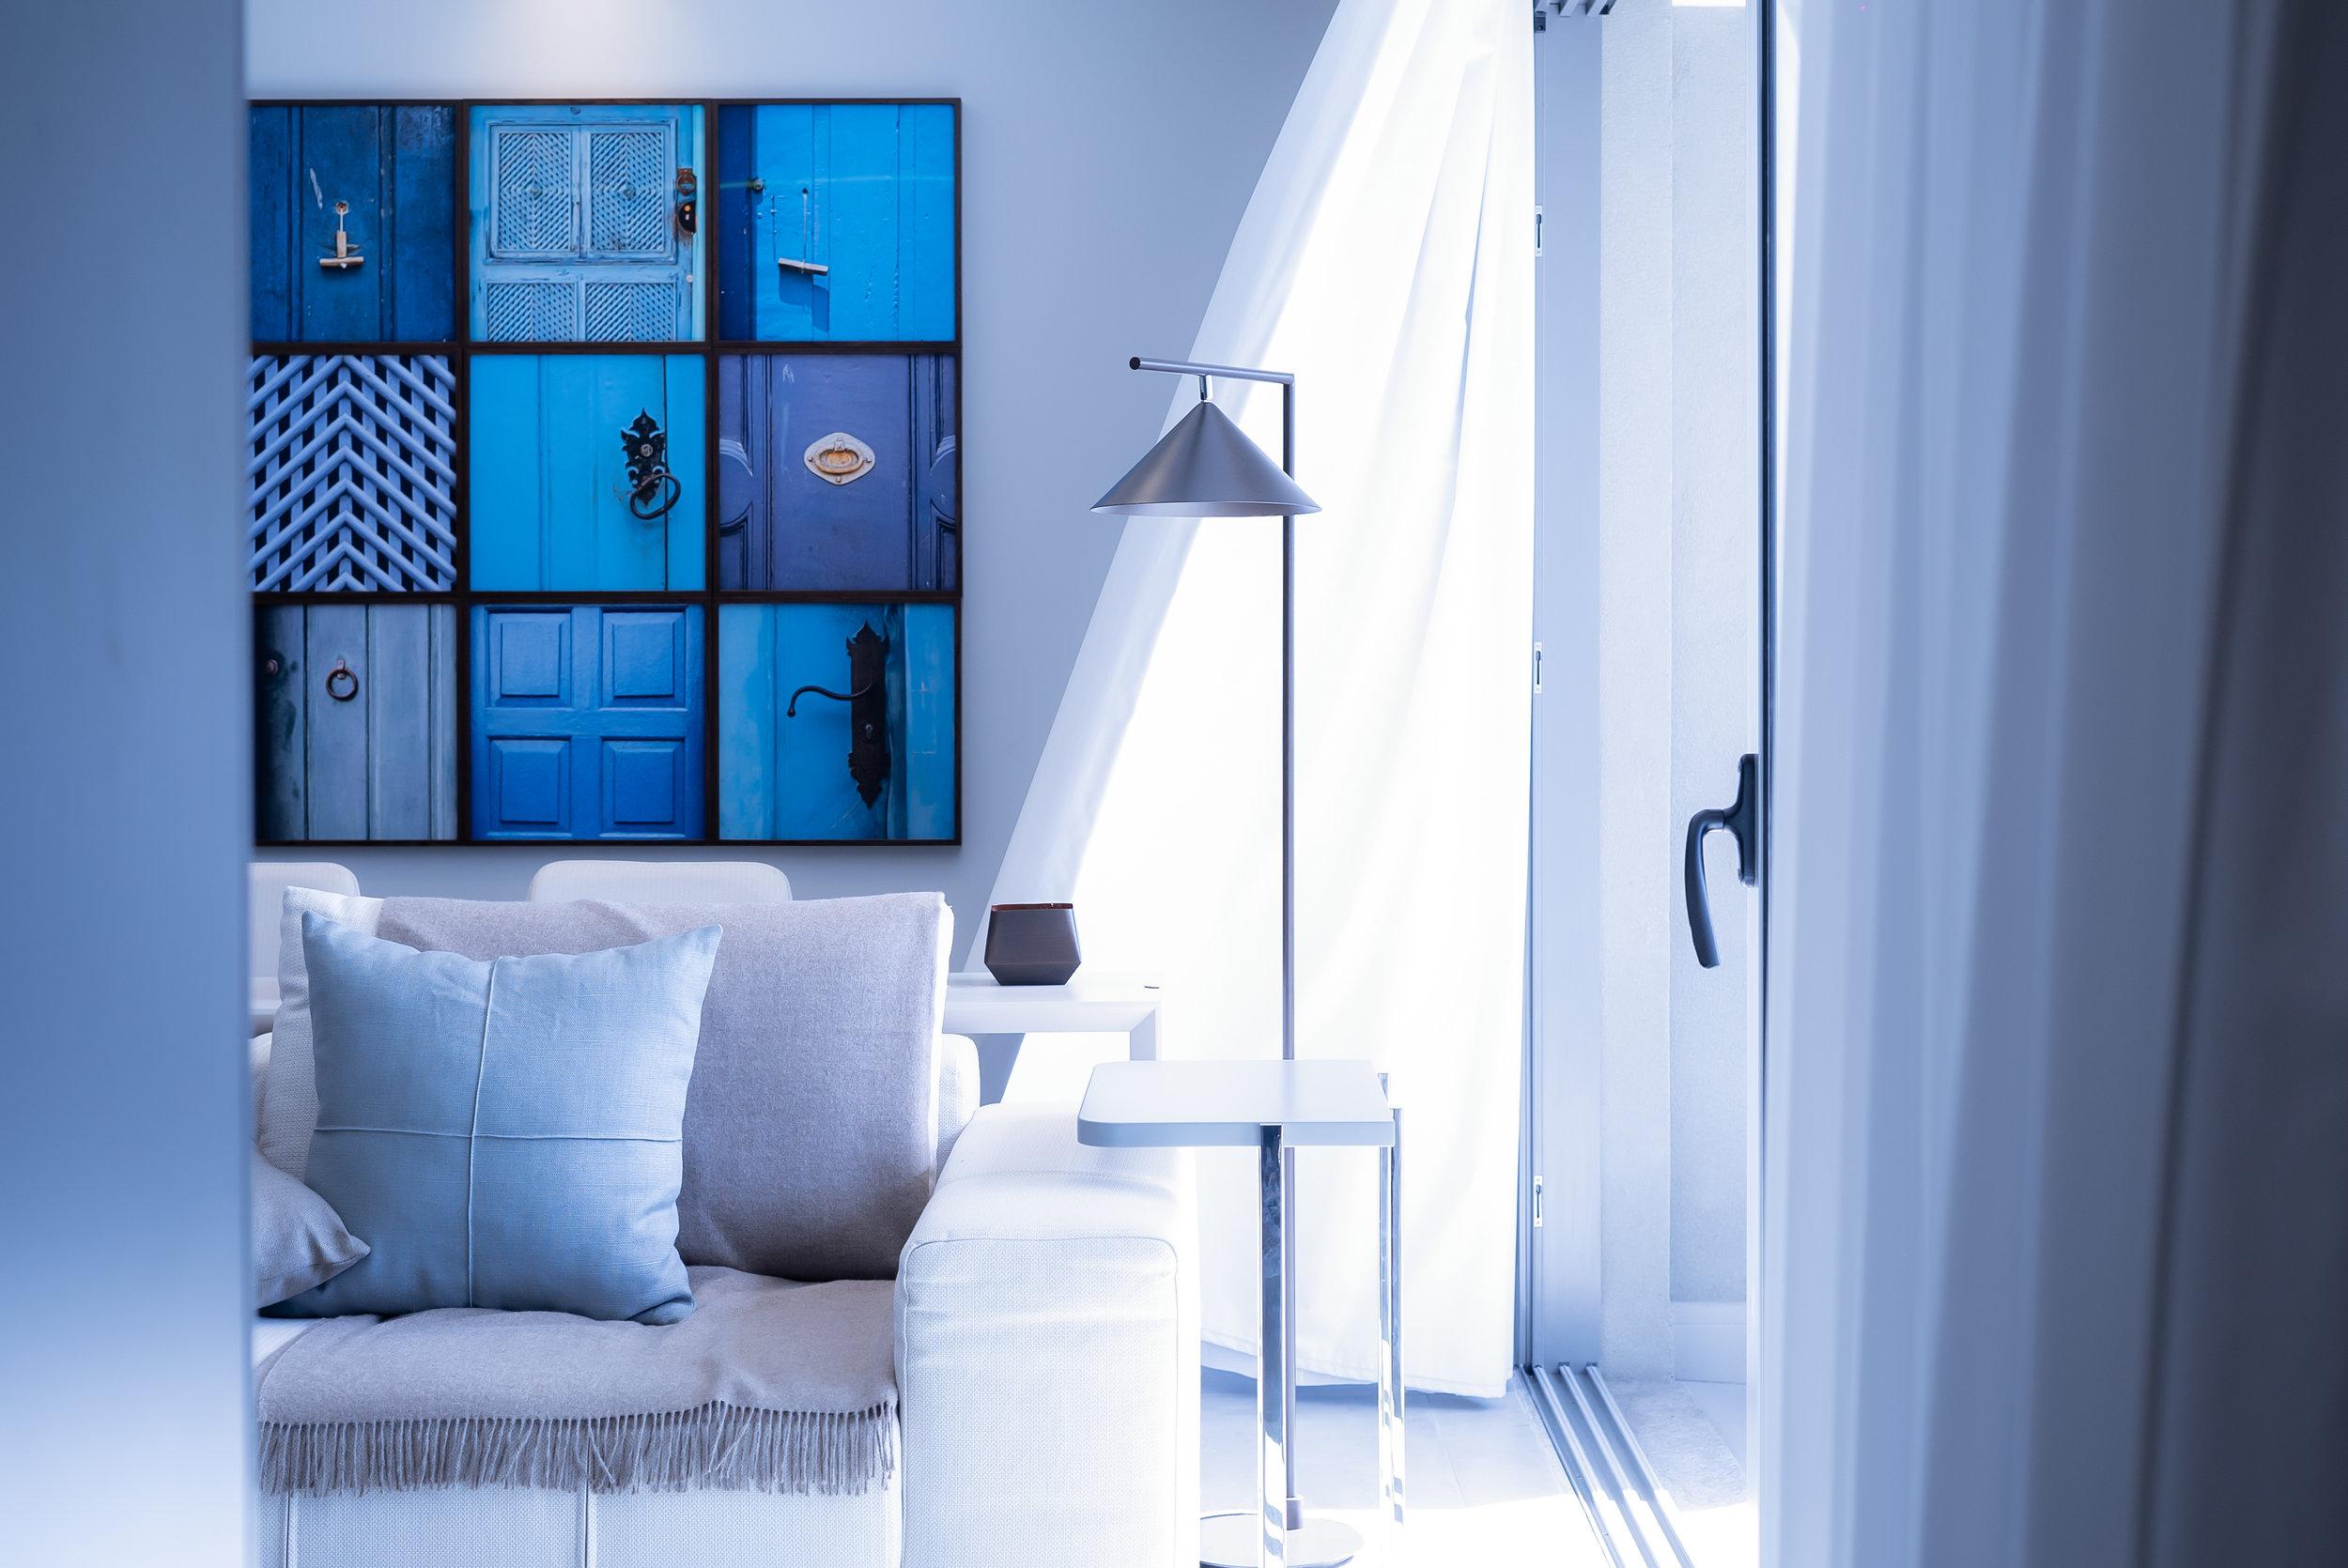 Cutrona Electric installs Smart Home technology.